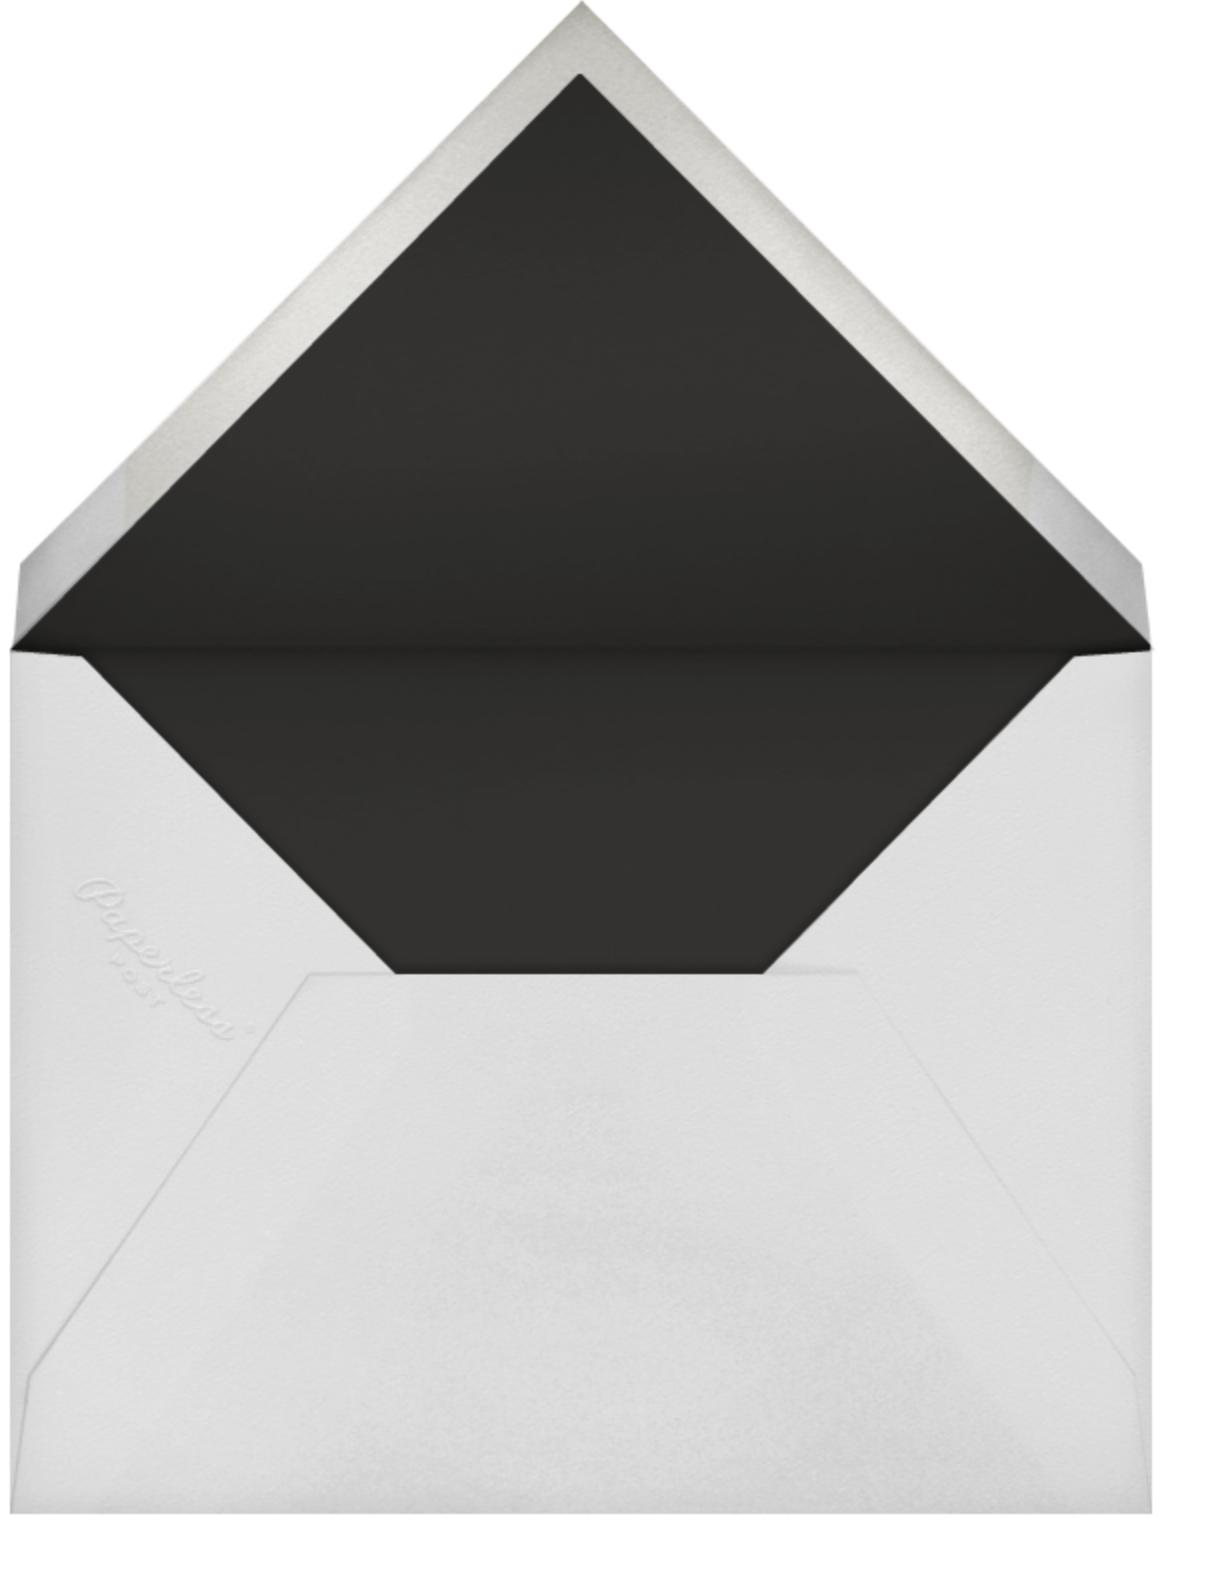 Floral Trellis II (Photo Save the Date) - Silver - Oscar de la Renta - Save the date - envelope back